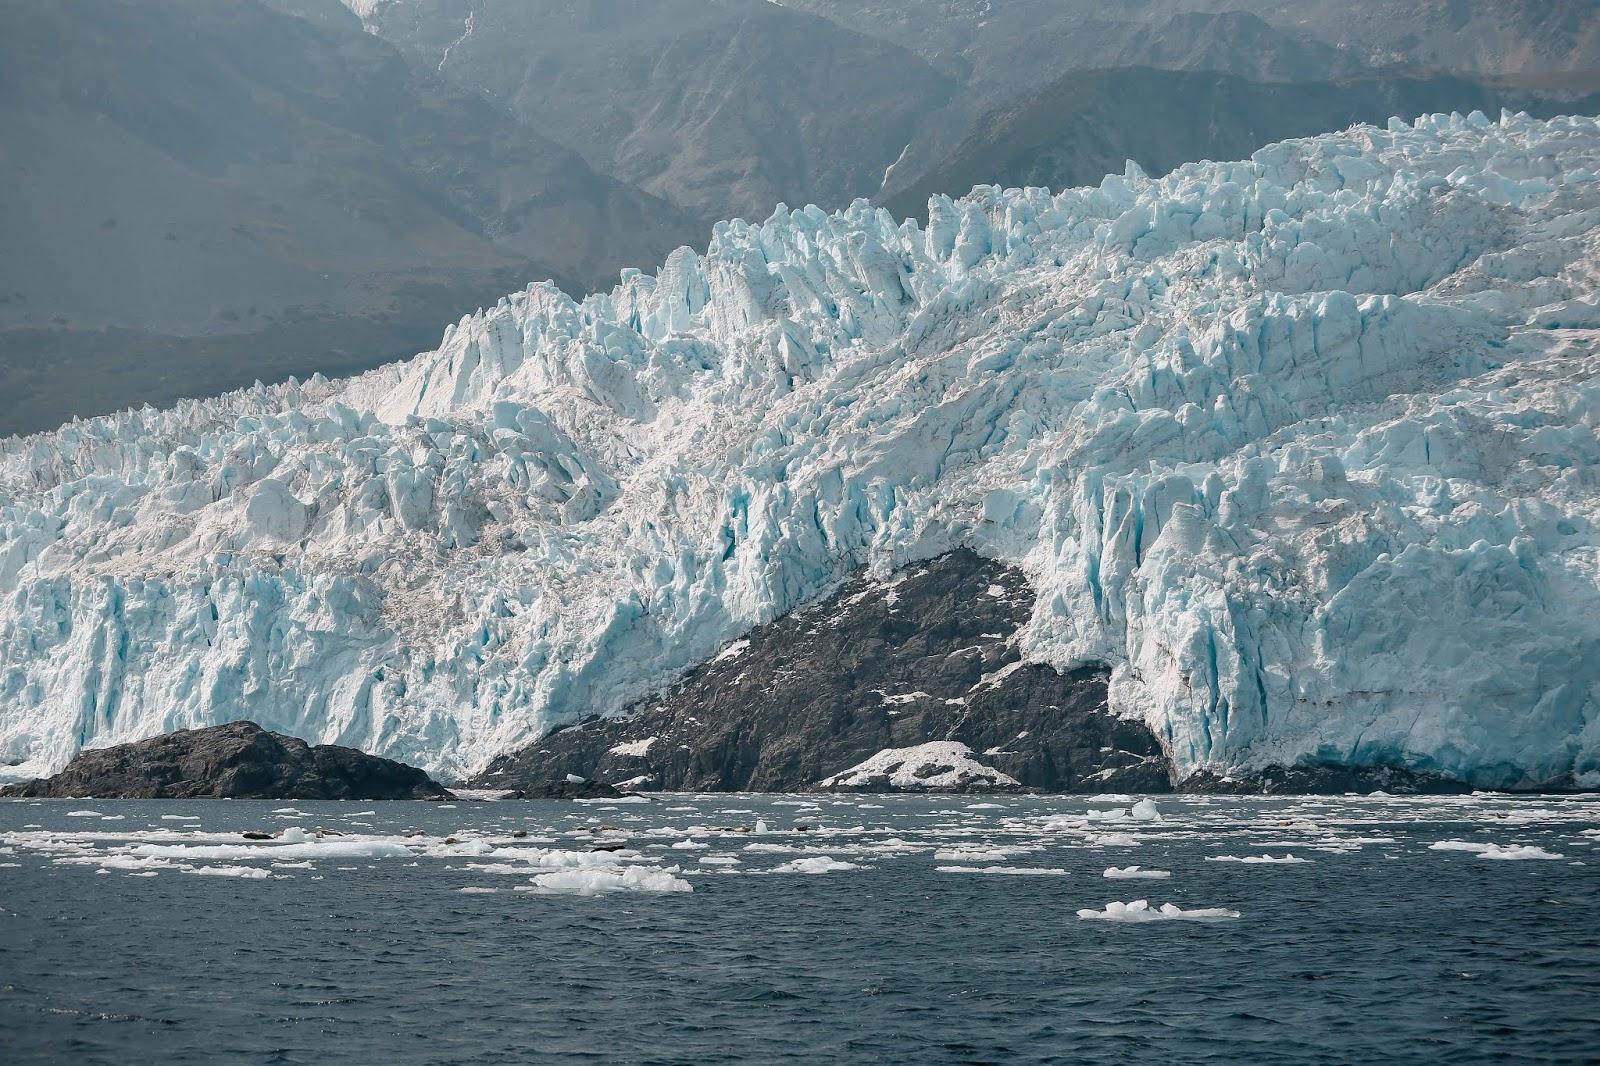 Aialik Glacier, Major Marine Tour, Kenai Fjords